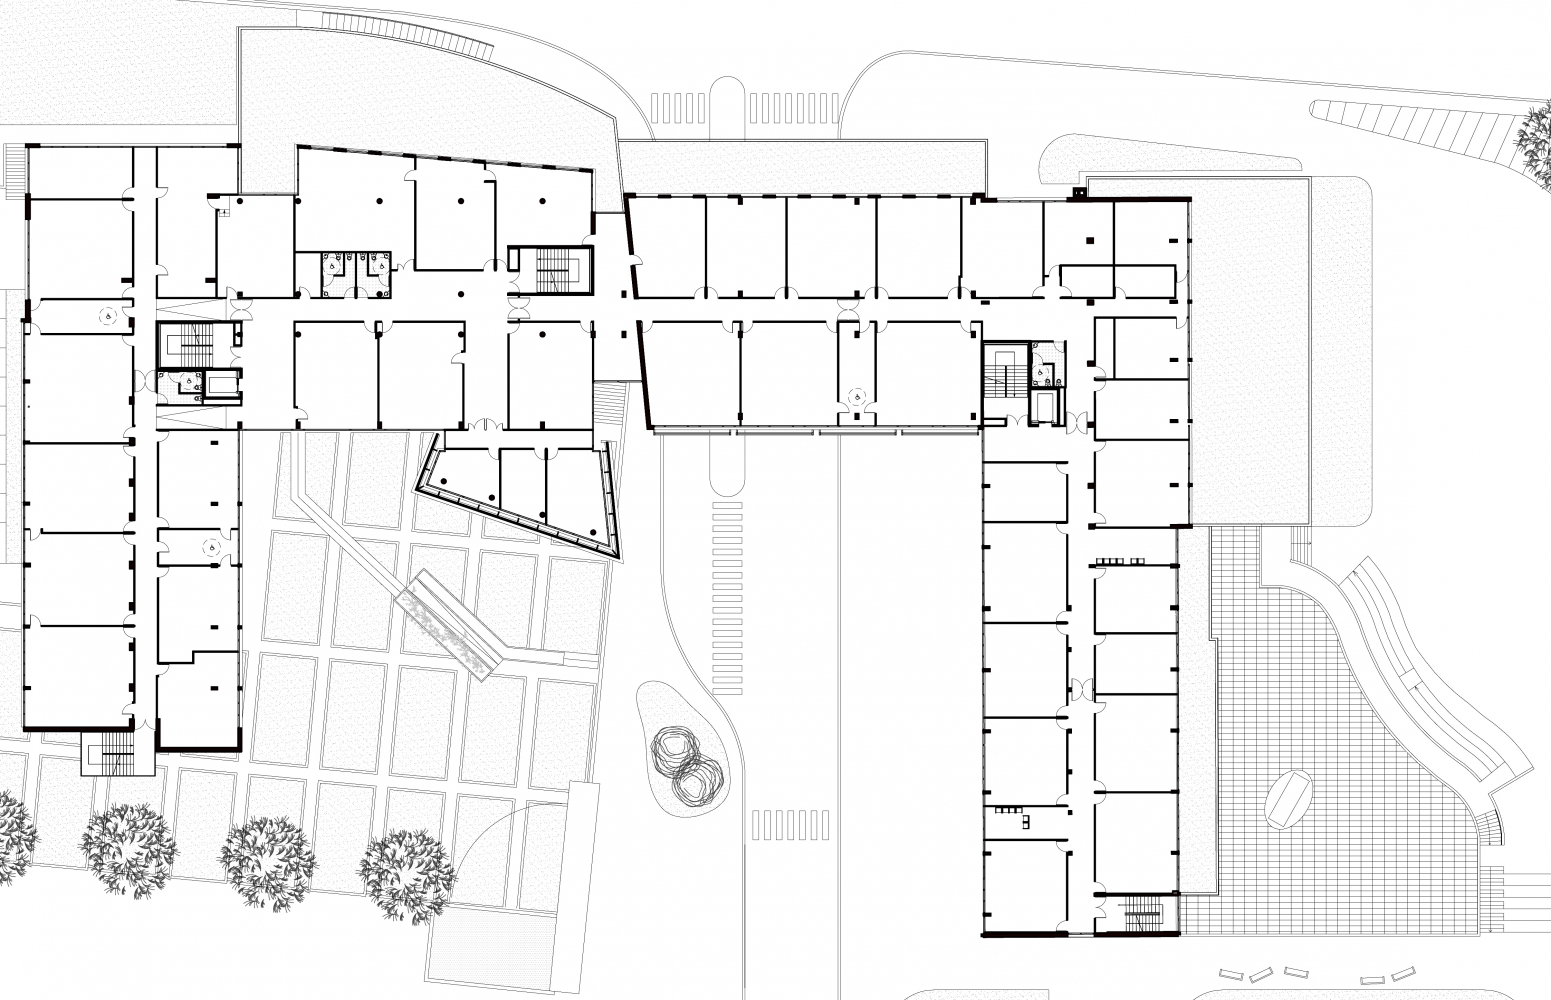 09-epernay-img-005 Pascale SEURIN Architecte - Pascale SEURIN Architecte